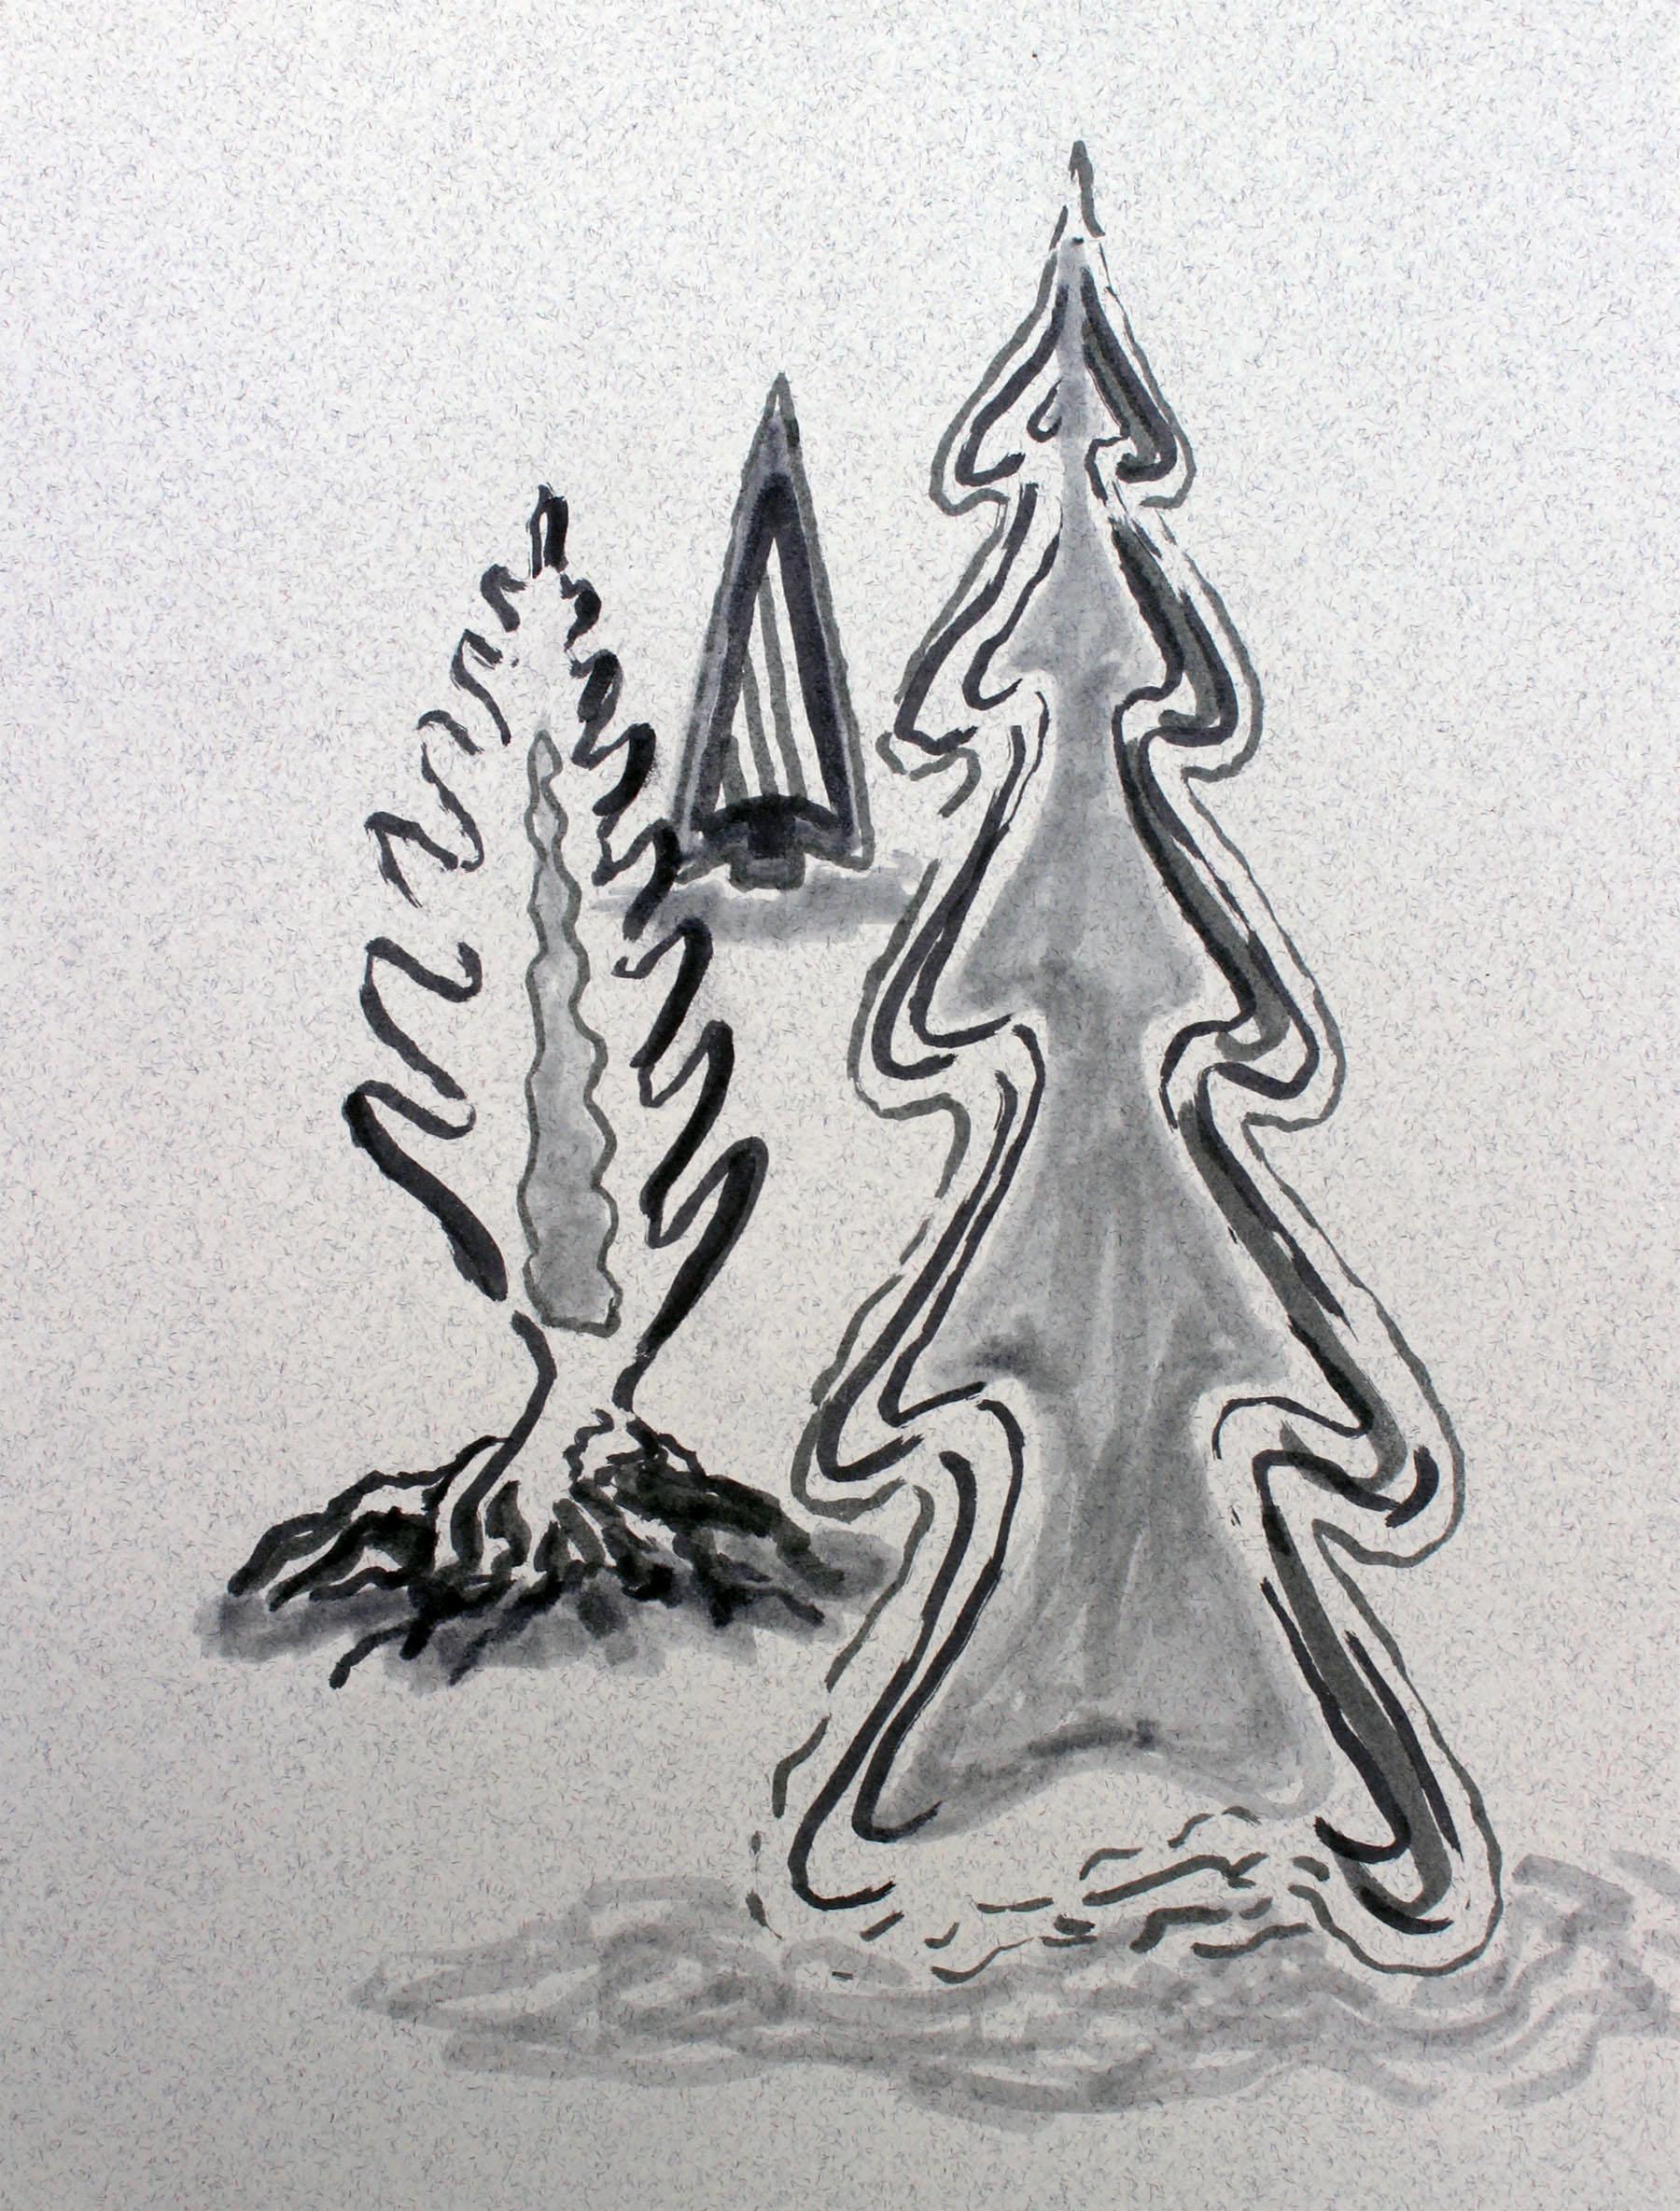 John DeFaro Tree sight tree 2017 pencil and marker on Cranes paper 8pt50 x 6pt50 inches